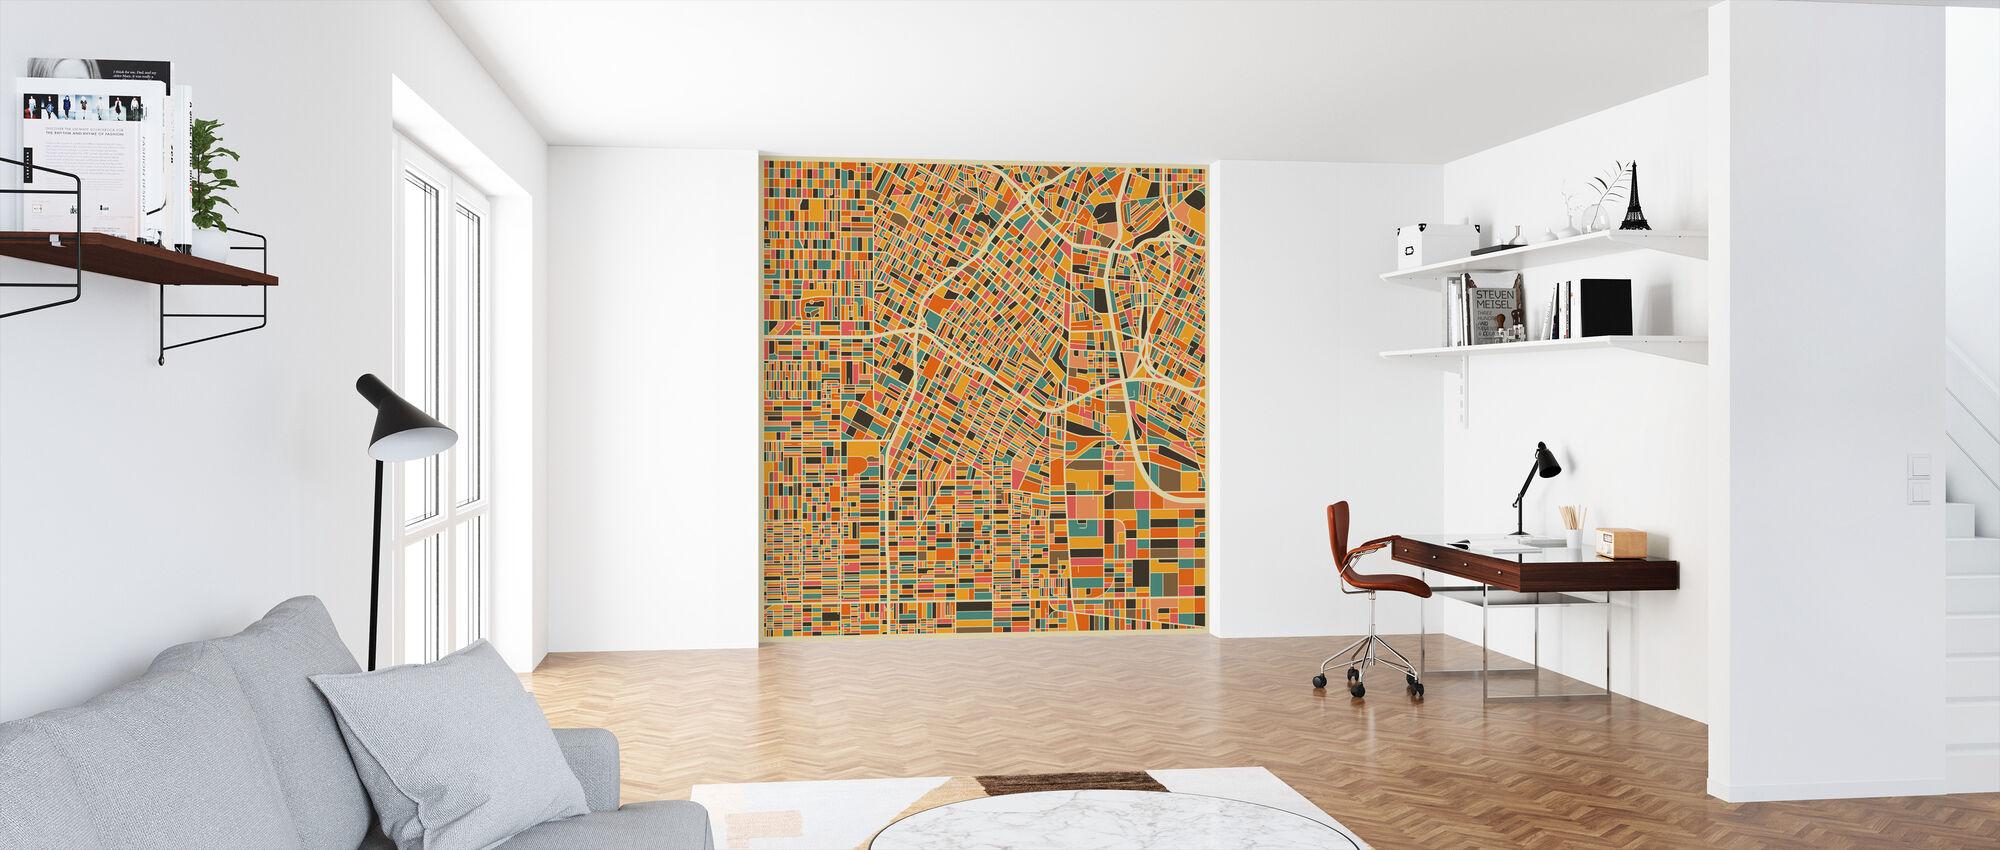 Multicolor Kartta - Los Angeles - Tapetti - Toimisto